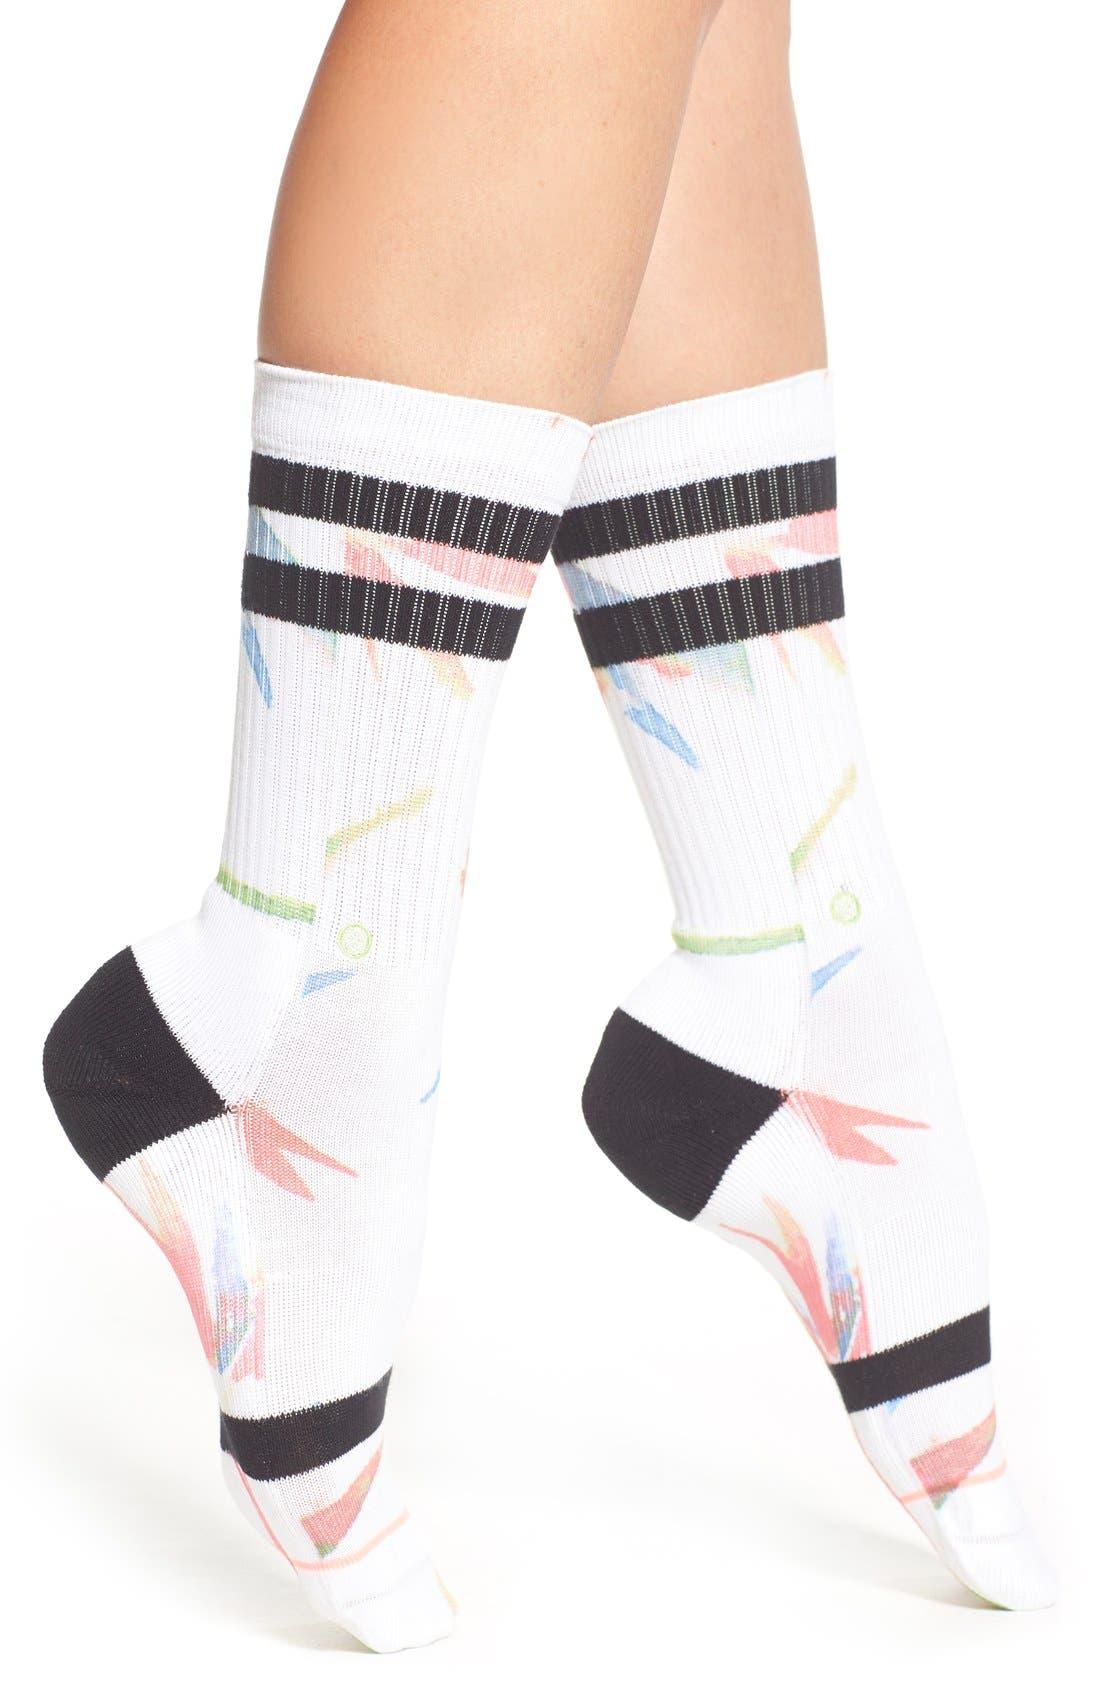 Alternate Image 1 Selected - Stance 'Birds of Paradise' Socks